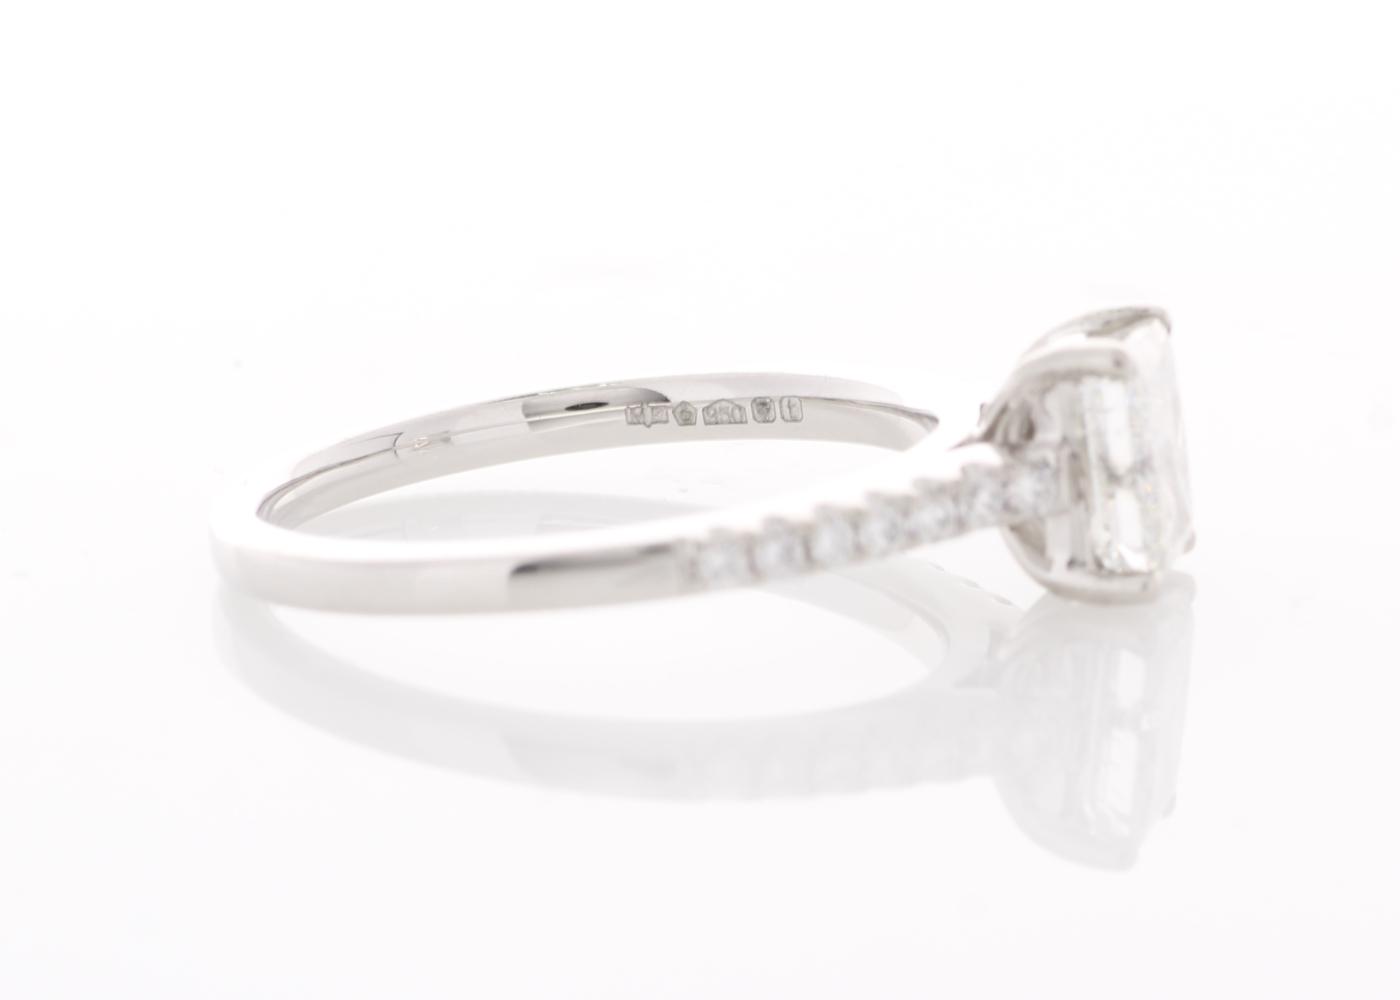 Platinum Stone Set Shoulders Diamond Ring 1.07 Carats - Image 4 of 5